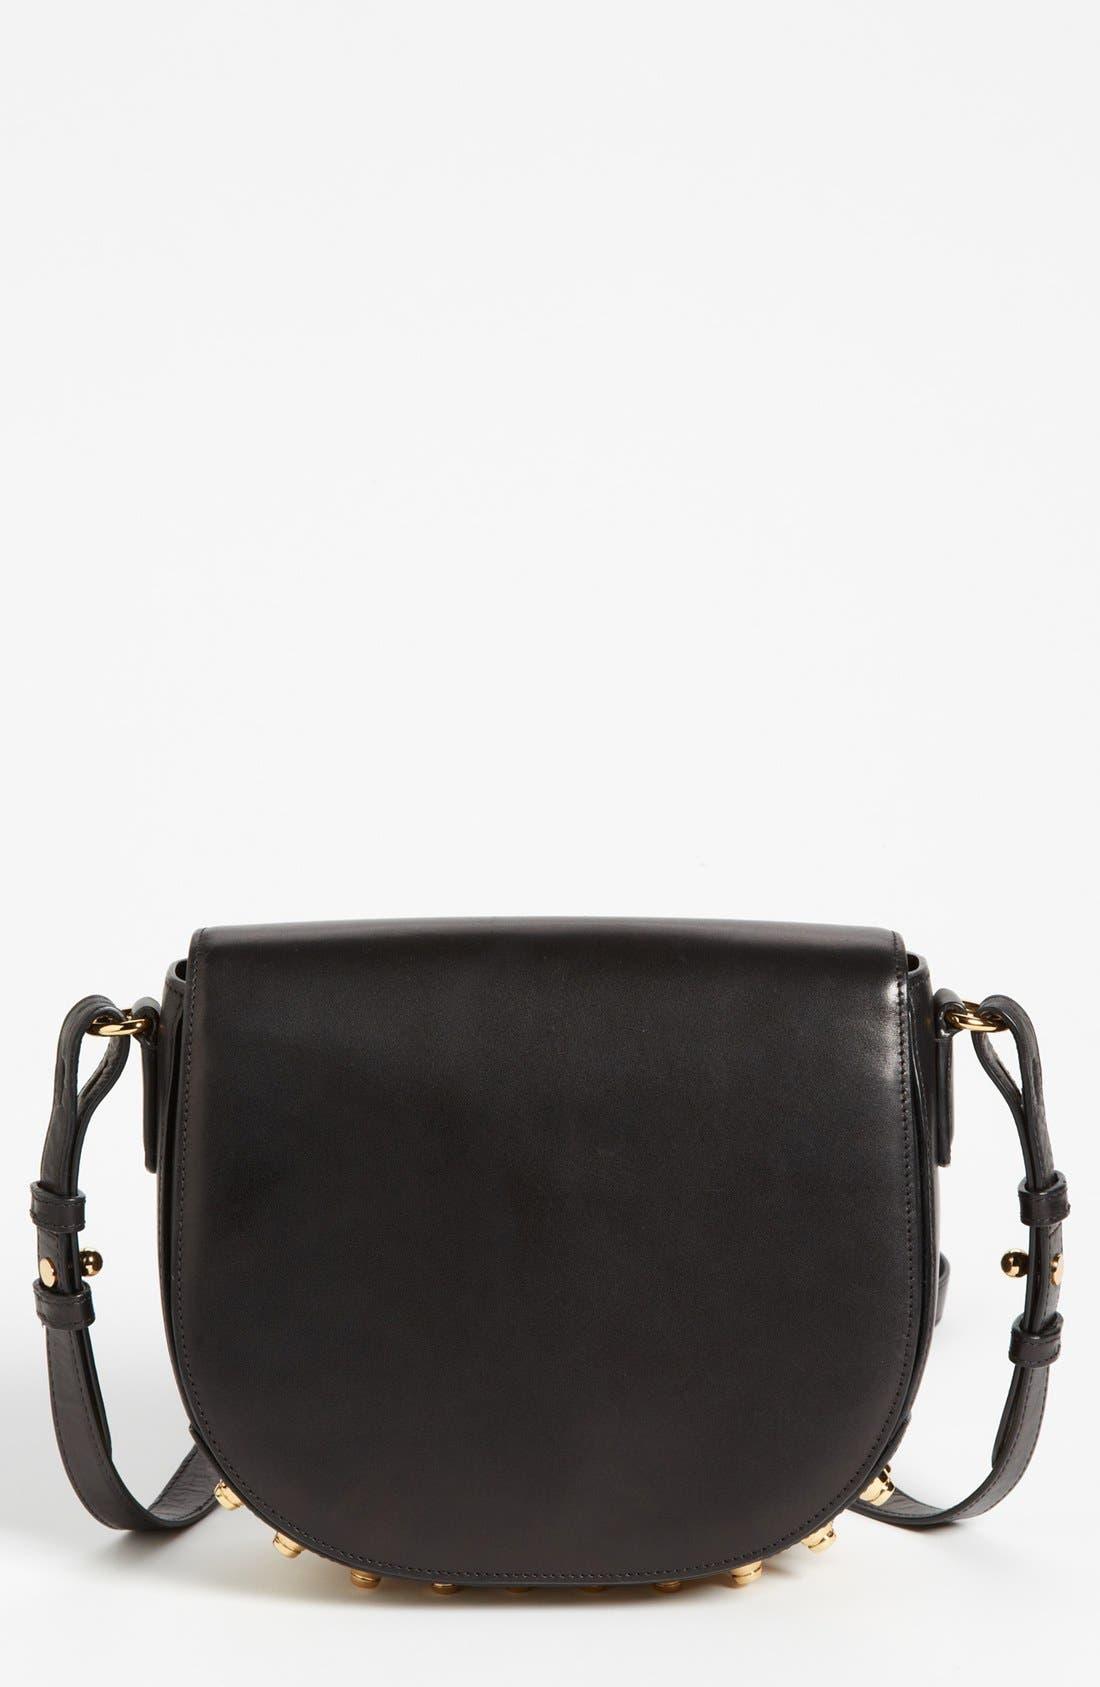 Alternate Image 1 Selected - Alexander Wang 'Lia - Small' Leather Crossbody Bag